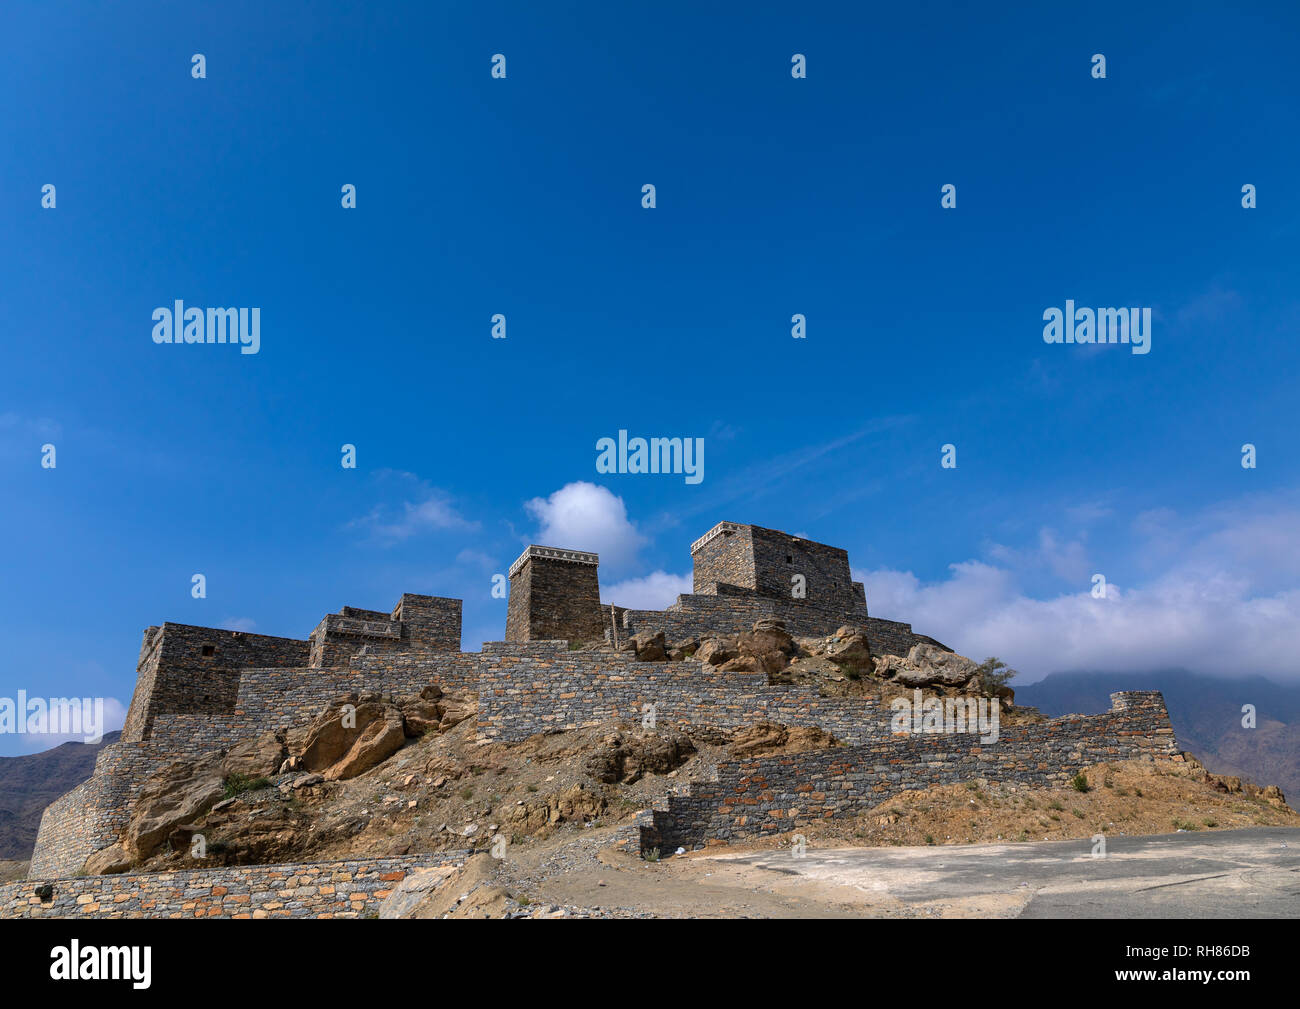 Dhee Ayn marble village, Al-Bahah region, Al Mukhwah, Saudi Arabia - Stock Image